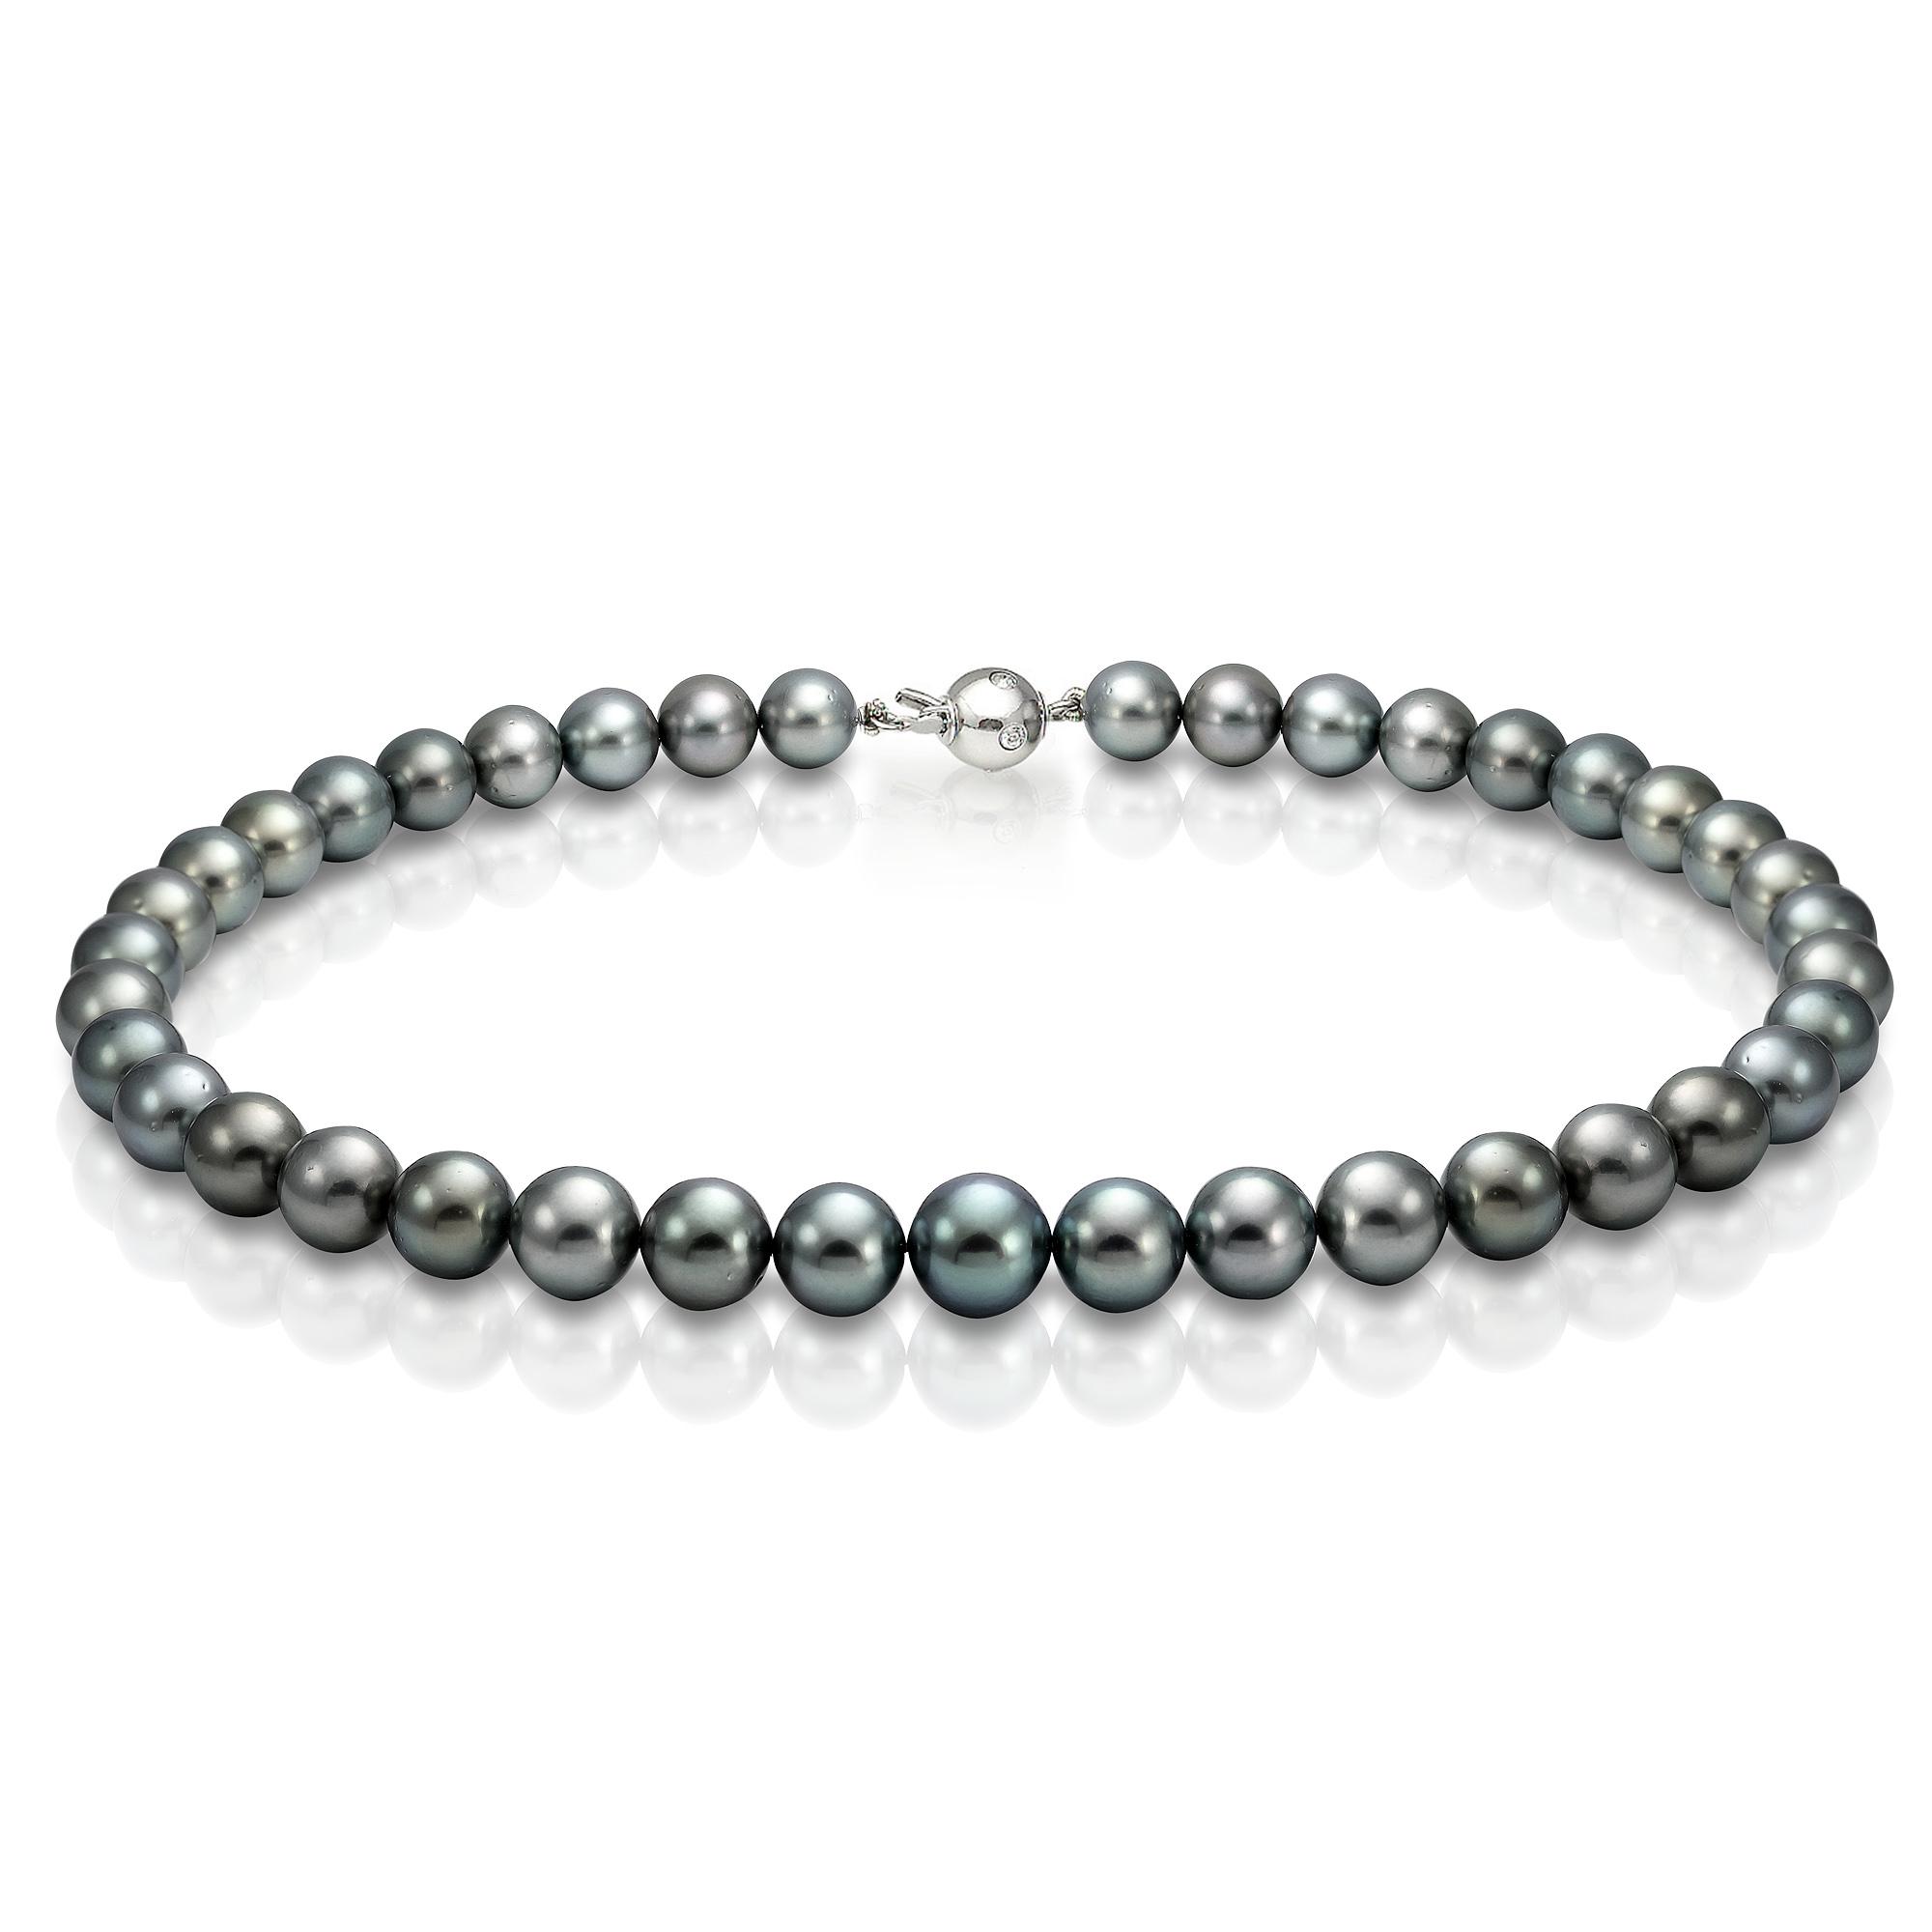 Ожерелье из серебристого круглого морского Таитянского жемчуга 10-11,7 мм